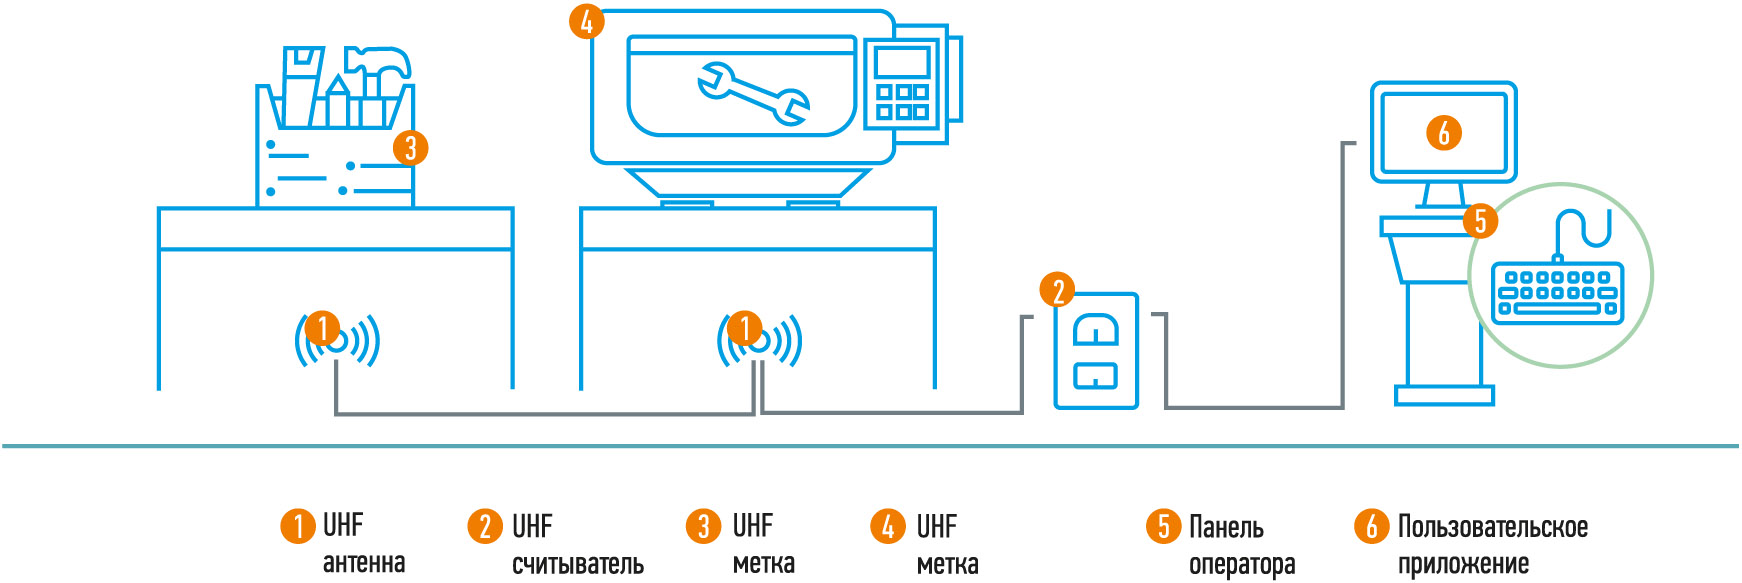 RFID для диспетчеризации и мониторинга